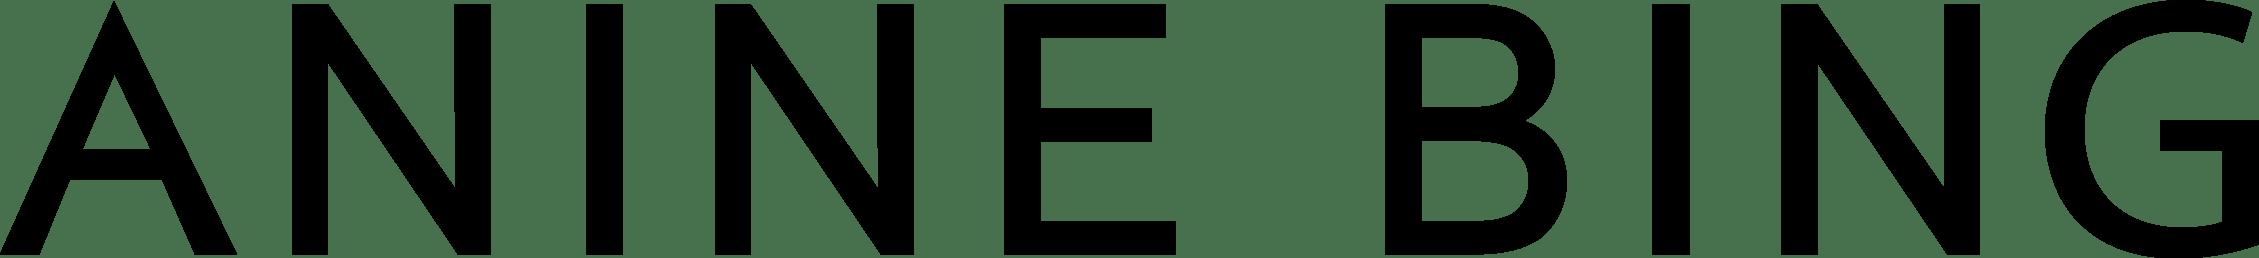 anine bing logo